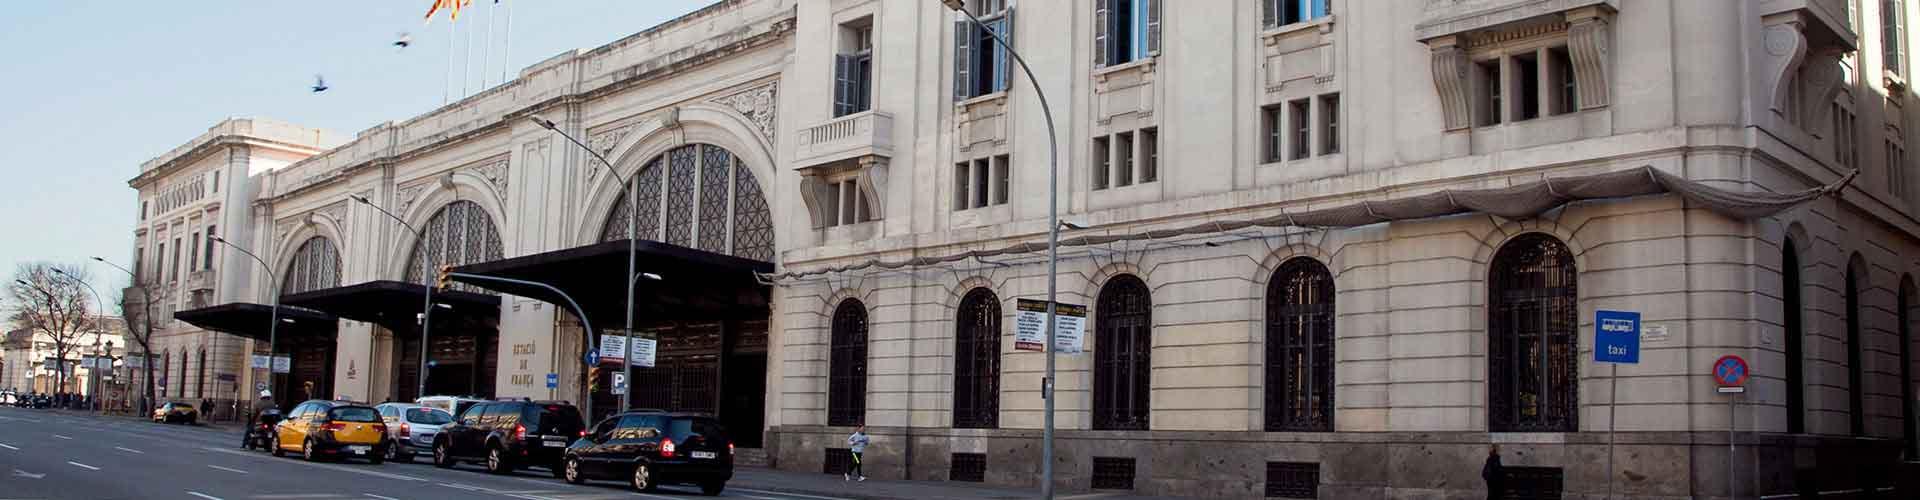 Barcelona - Hoteles baratos cerca a Estación de tren de França. Mapas de Barcelona, Fotos y comentarios de cada Hotel en Barcelona.